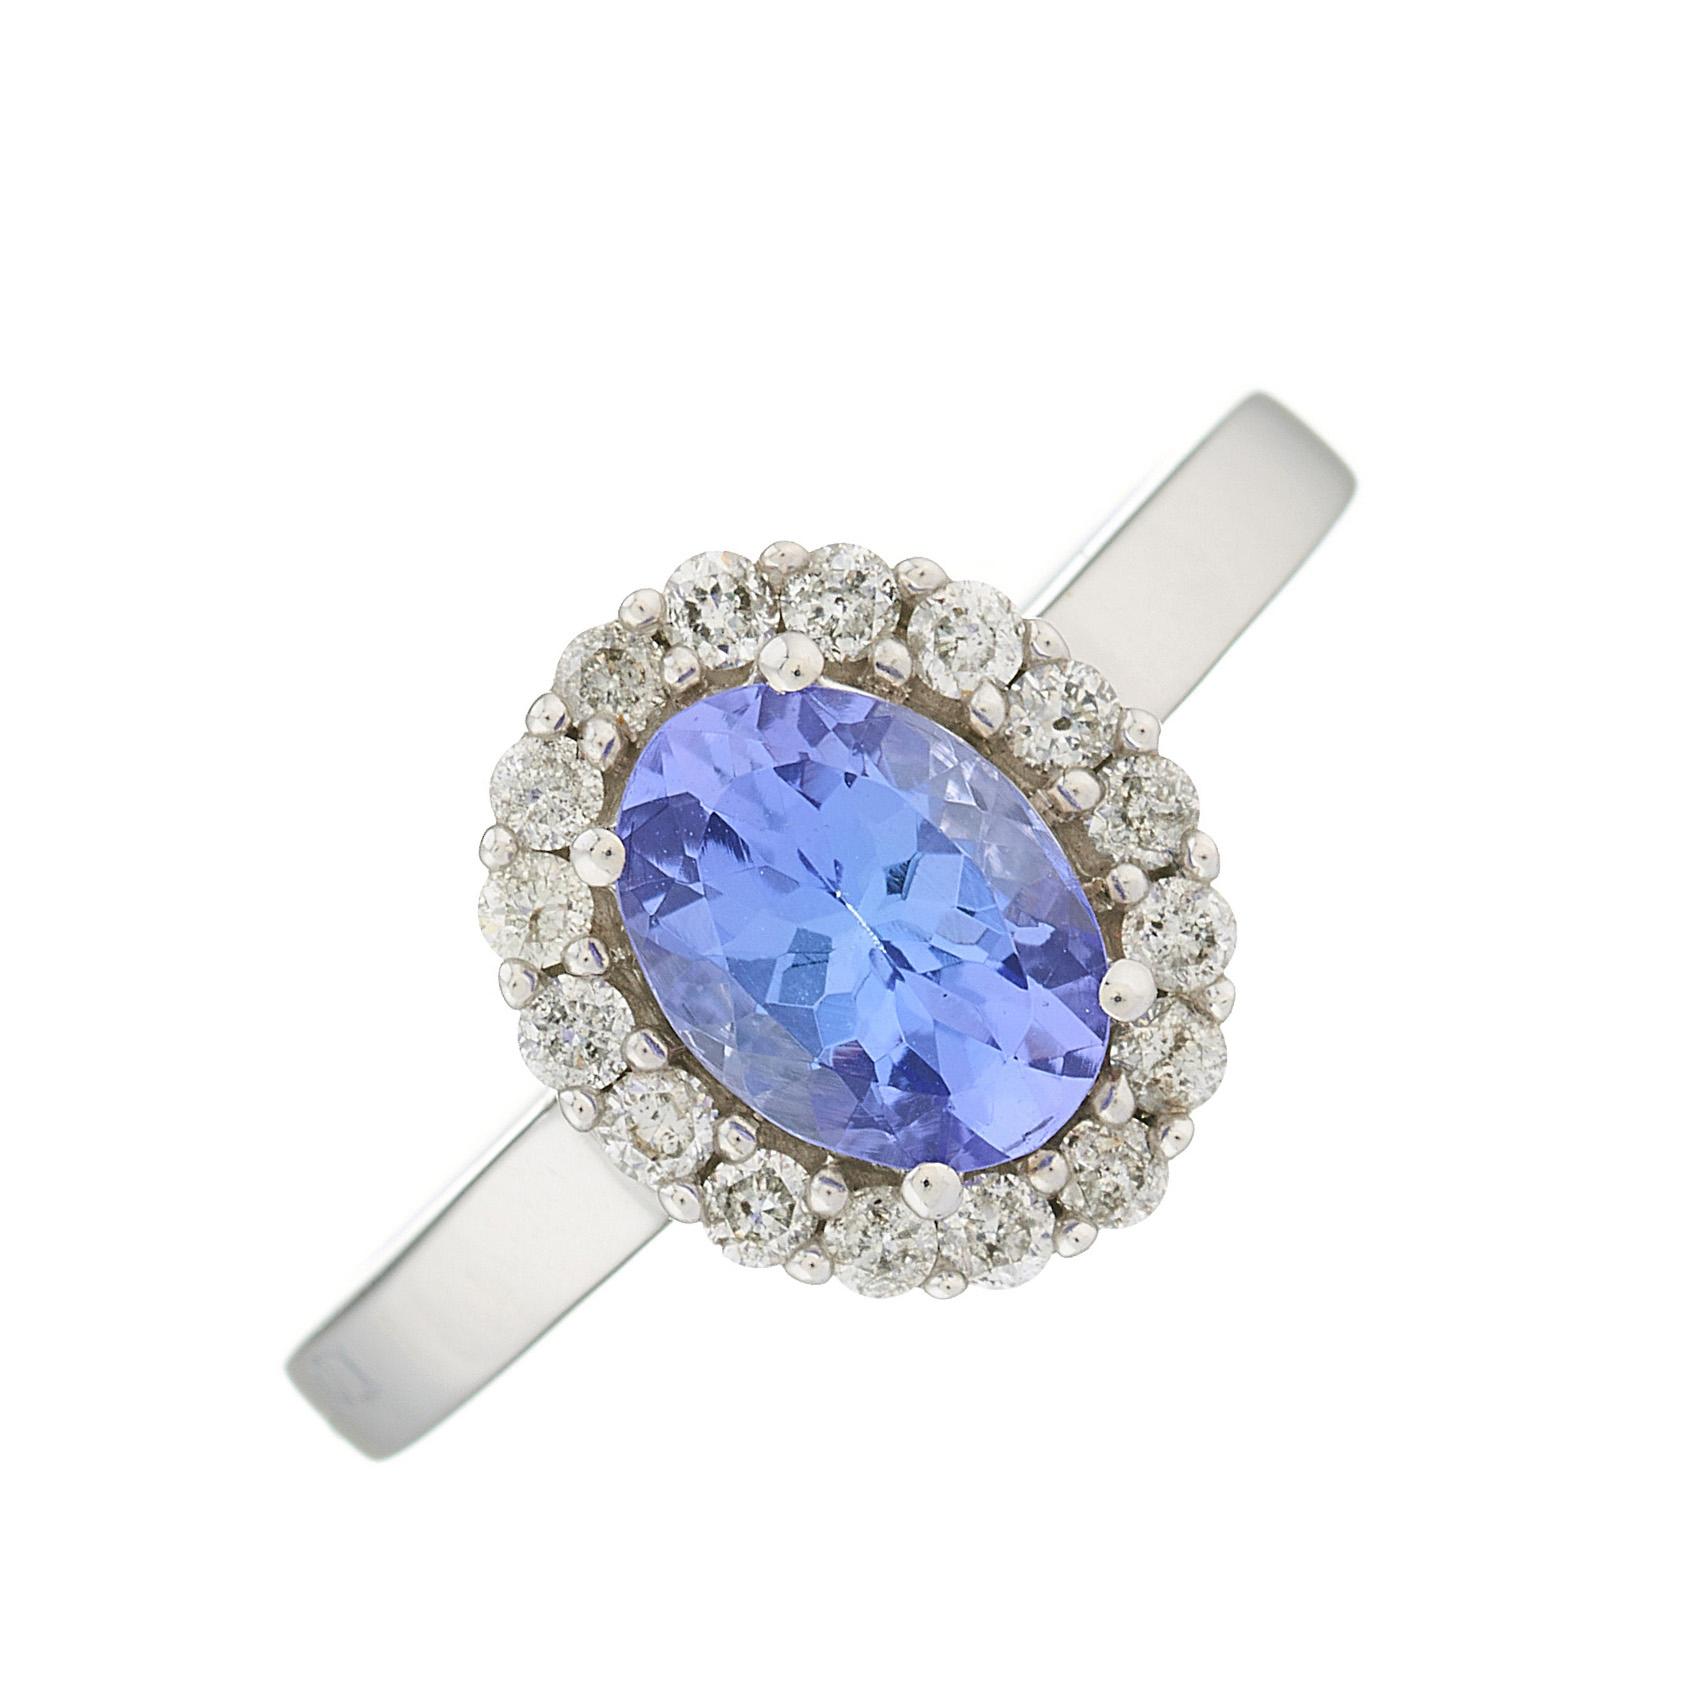 A 14ct gold tanzanite and brilliant-cut diamond cluster ring